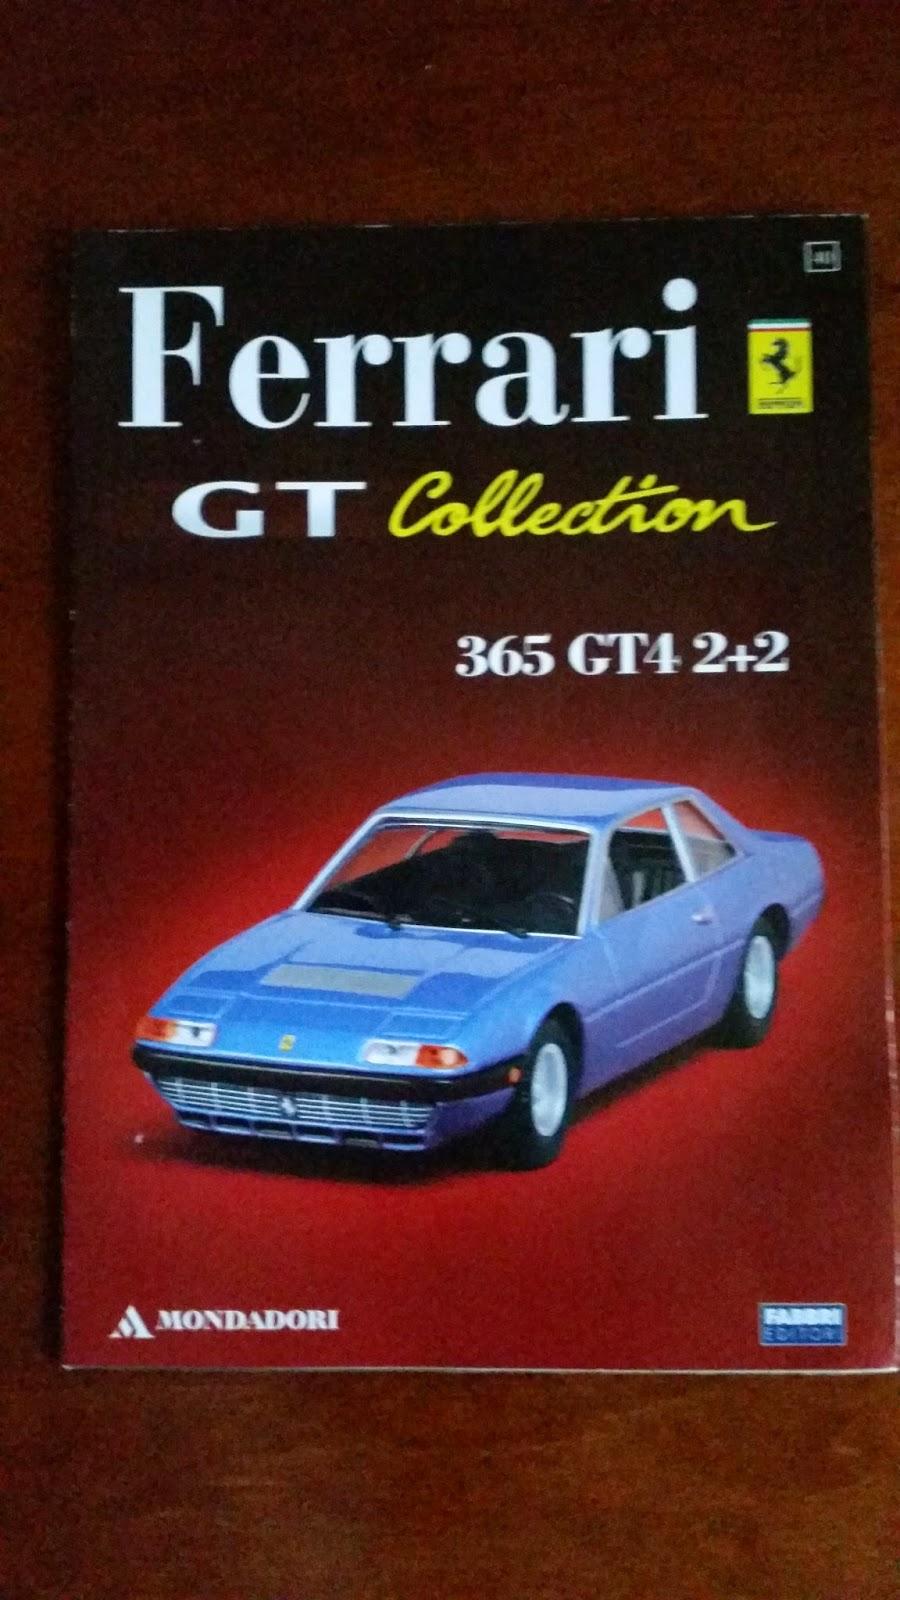 ferrari 400 ferrari gt collection by mondadori ferrari 365 gt4 2 2 1 43 scale model. Black Bedroom Furniture Sets. Home Design Ideas